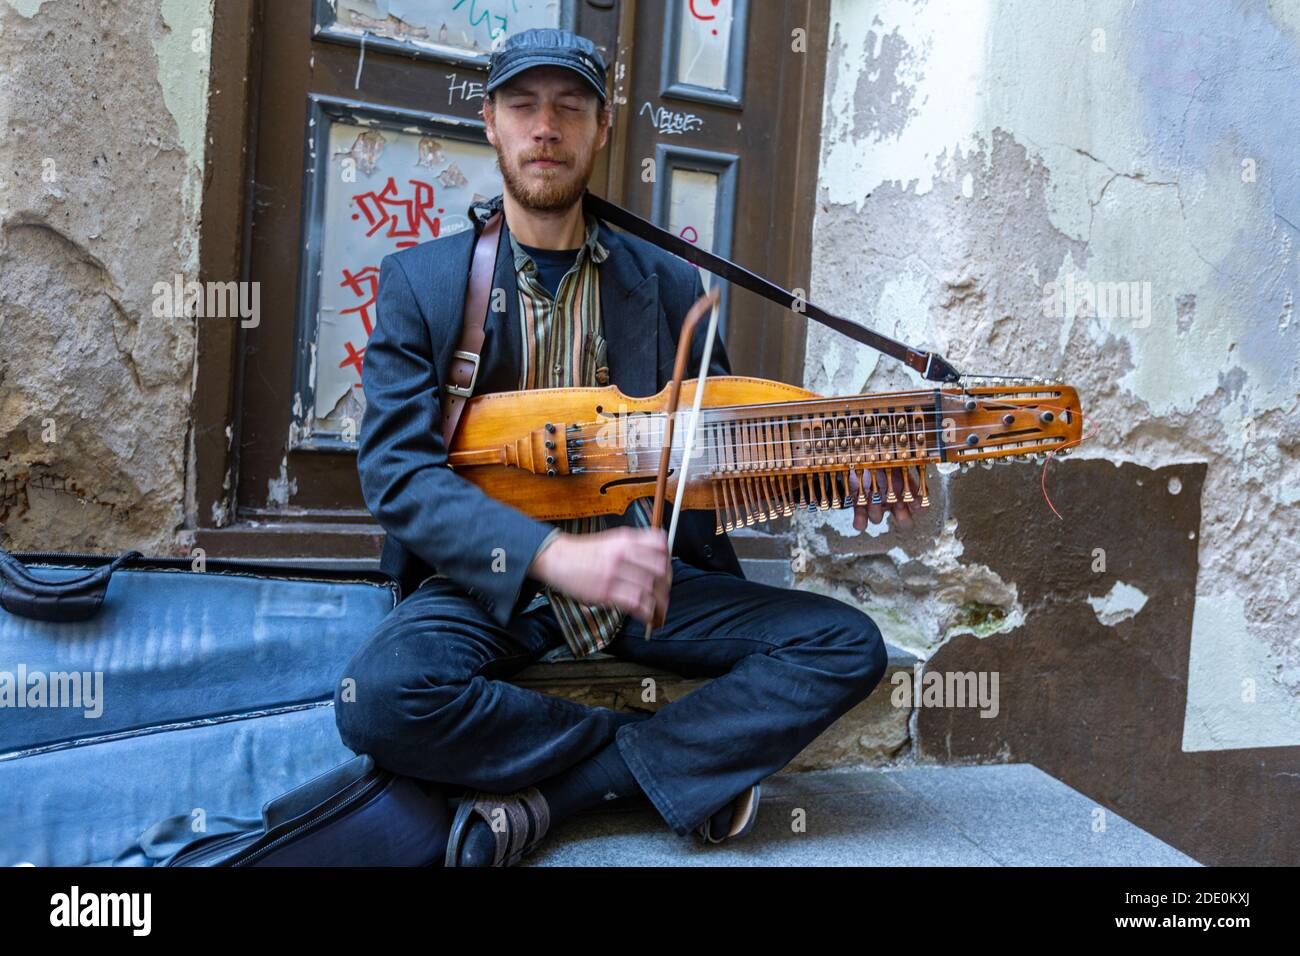 music-street-man-playing-a-nyckelharpa-a